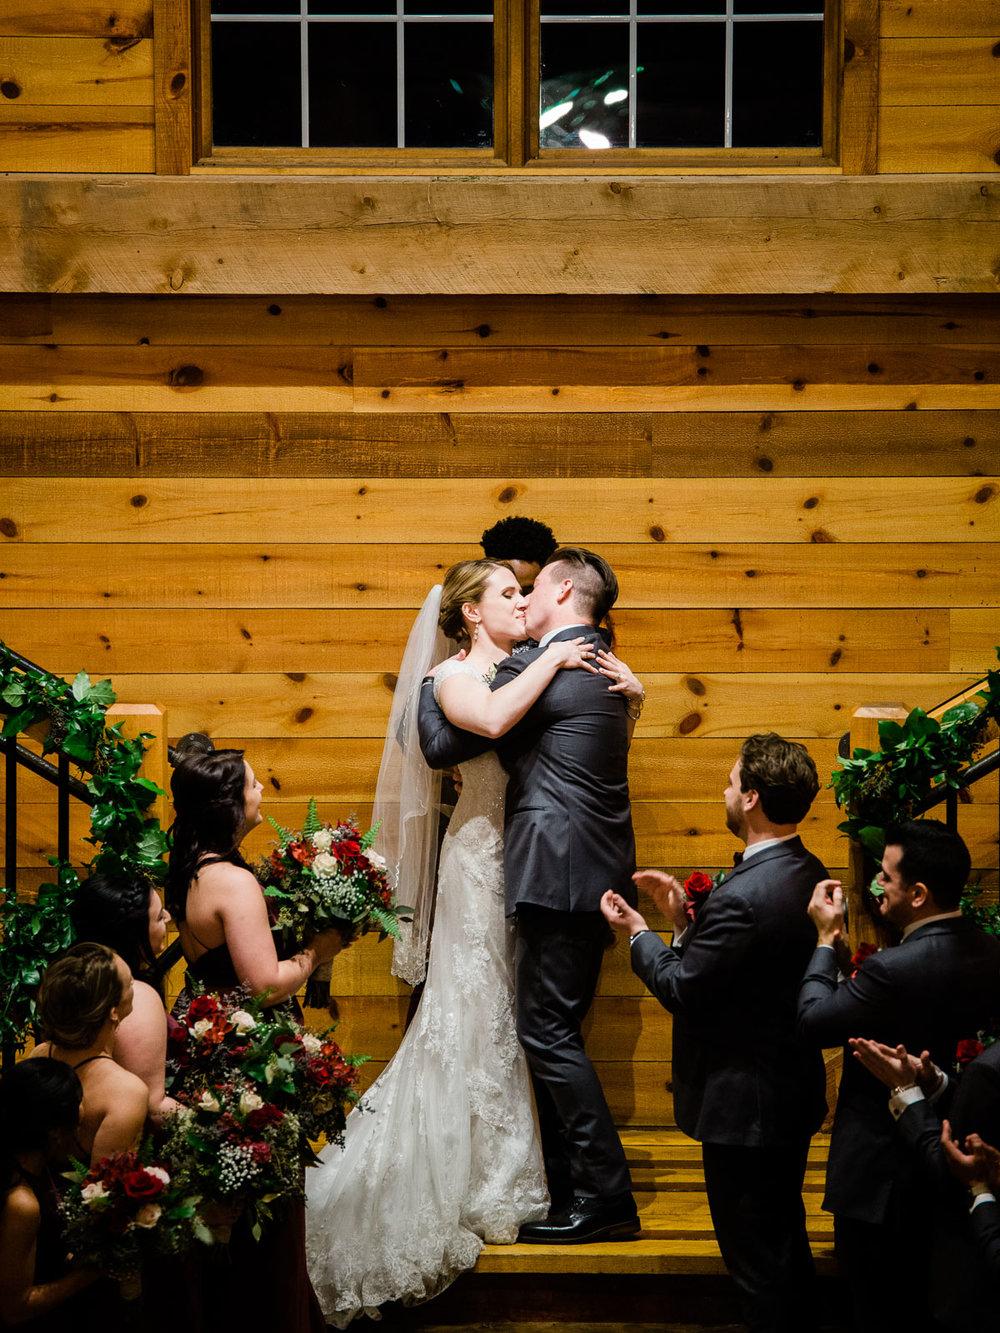 mapleside-farms-cleveland-wedding-photography-matt-erickson-photography-16.jpg